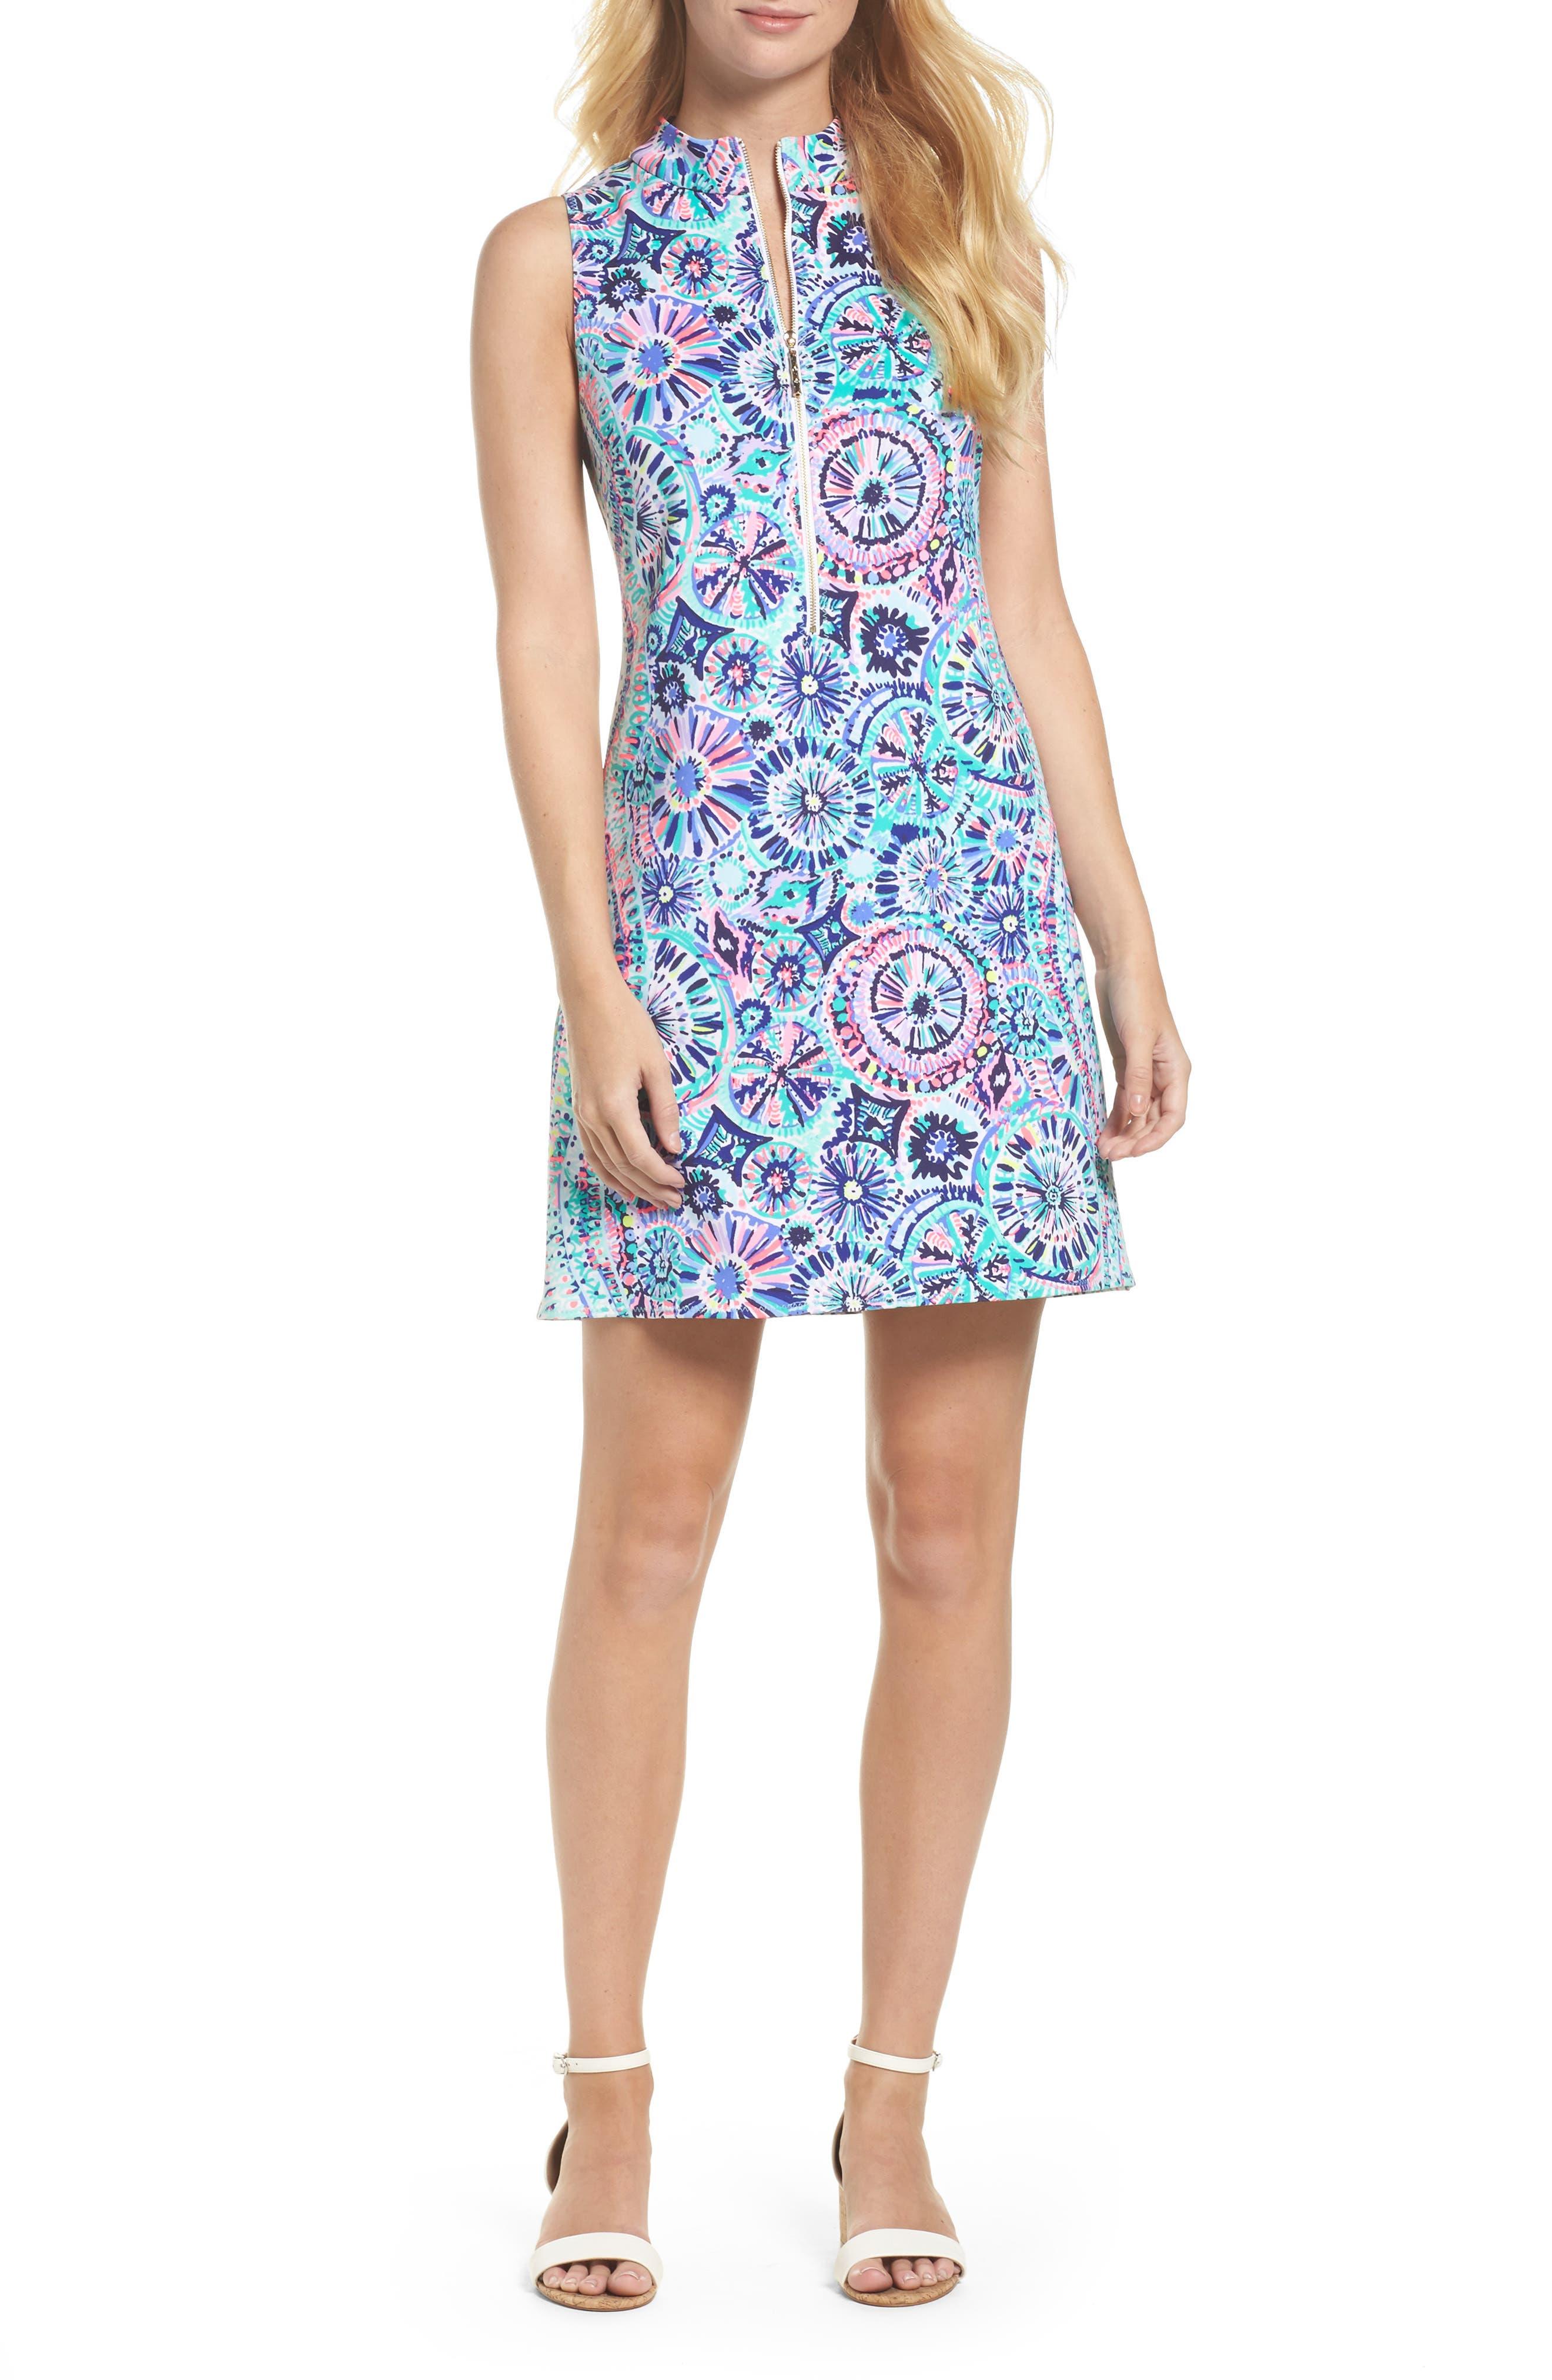 Opal Sheath Dress,                             Main thumbnail 1, color,                             Multi The Swim